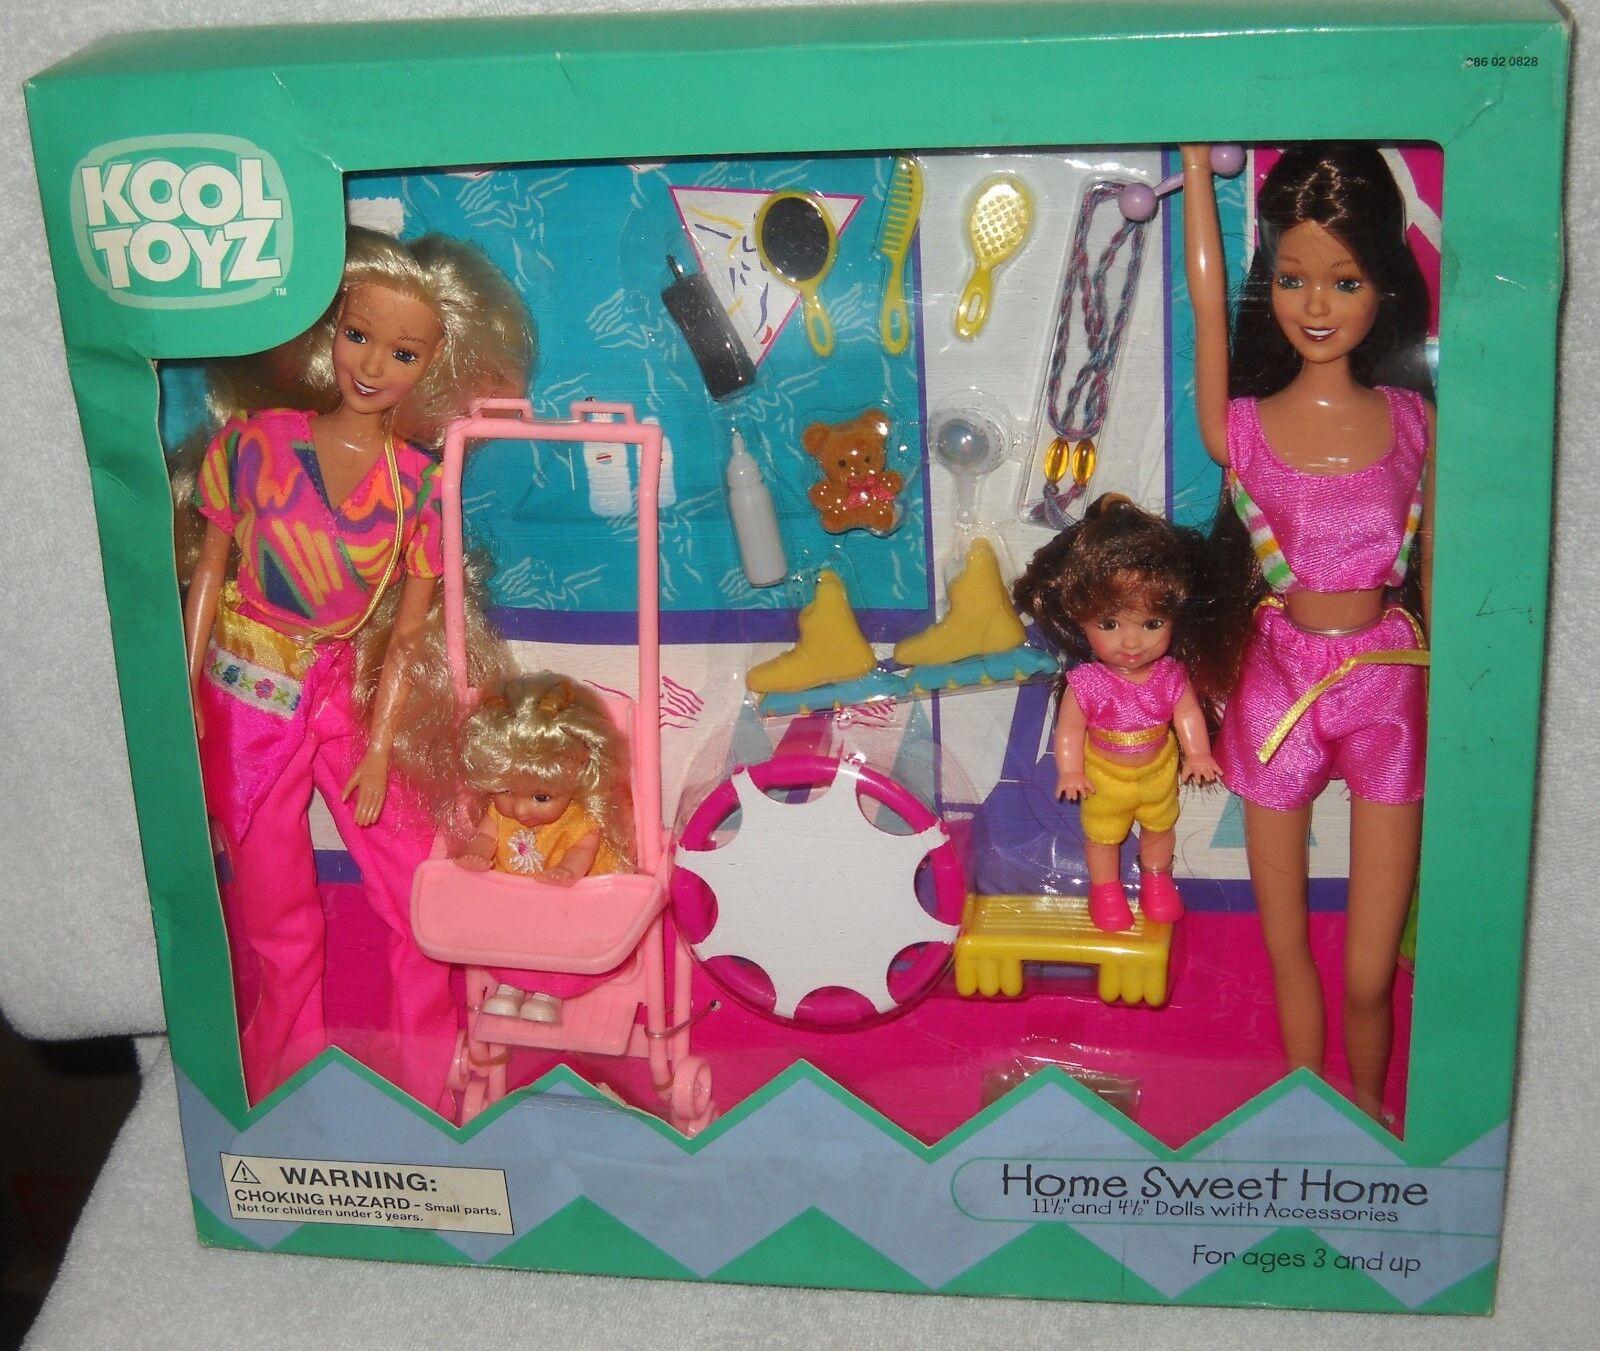 Nunca quitado de la caja de destino tiendas Kool Juguetes Home Sweet Home Fashion Doll Set